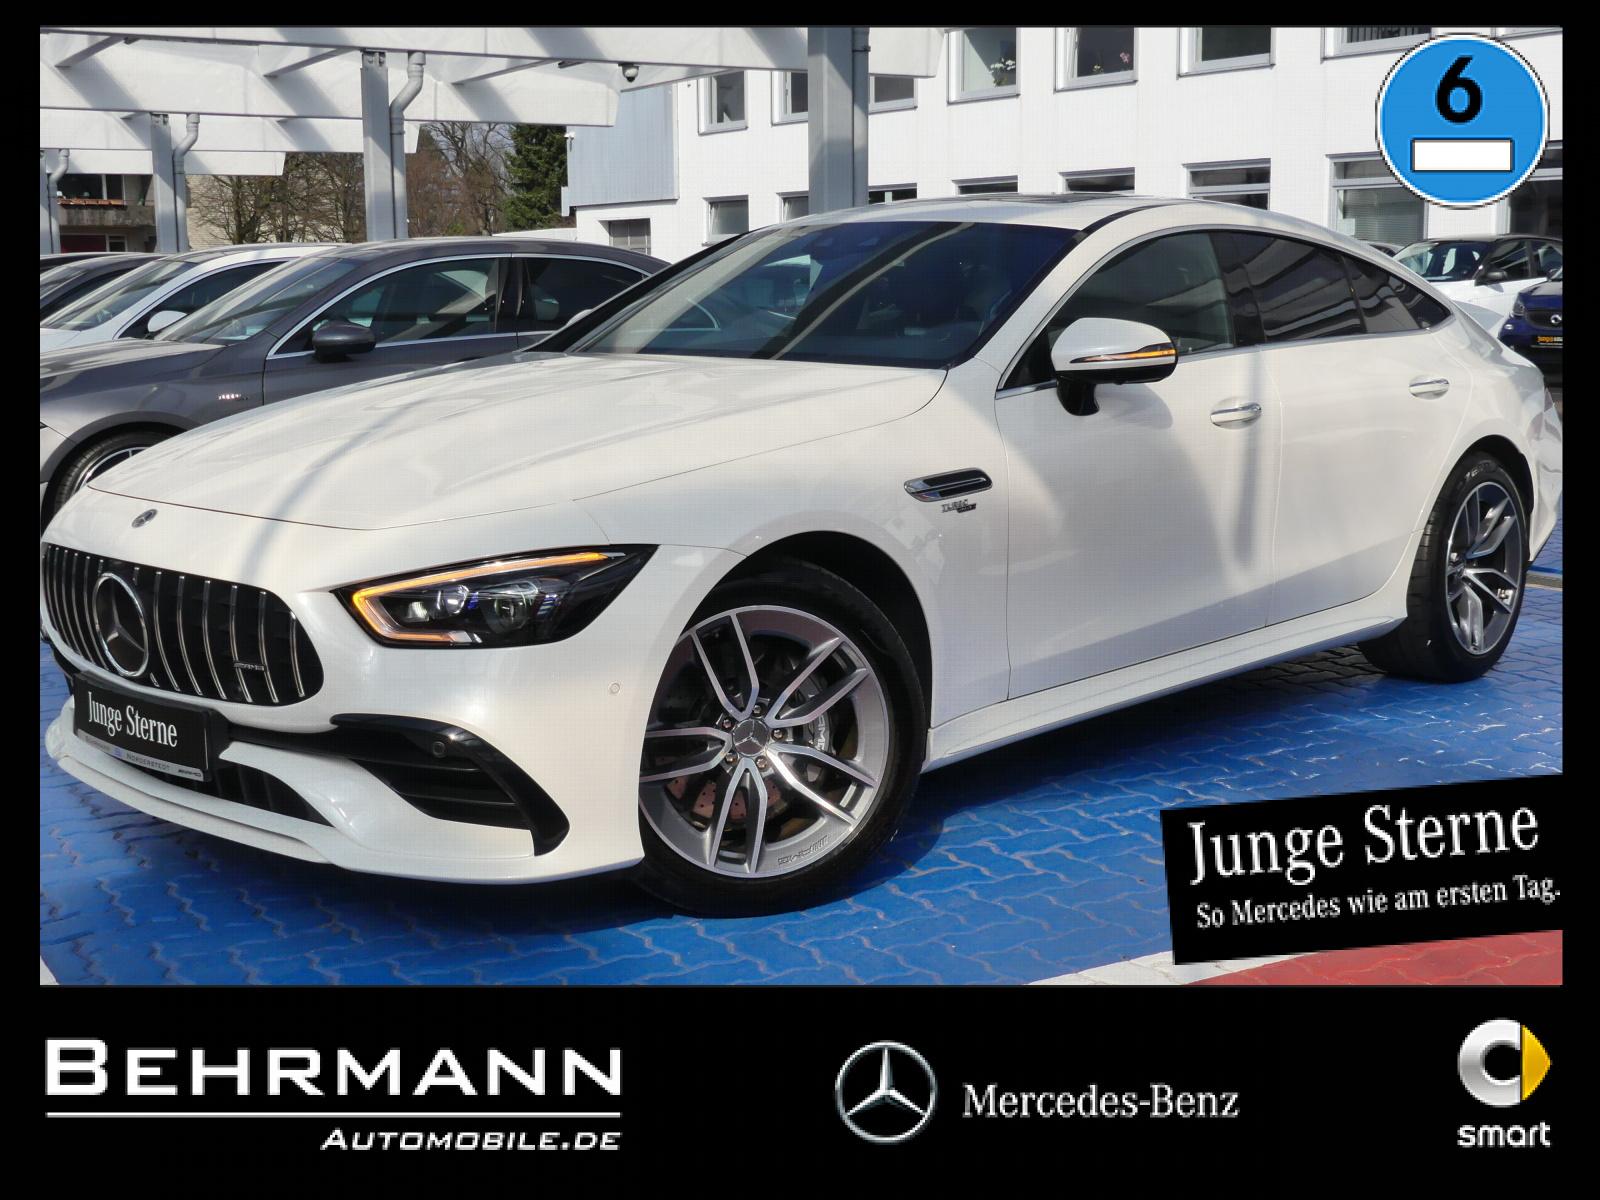 Mercedes-Benz AMG GT 53 4M +360°Kamera+AHK+StandHzg+Burmester+, Jahr 2019, Benzin